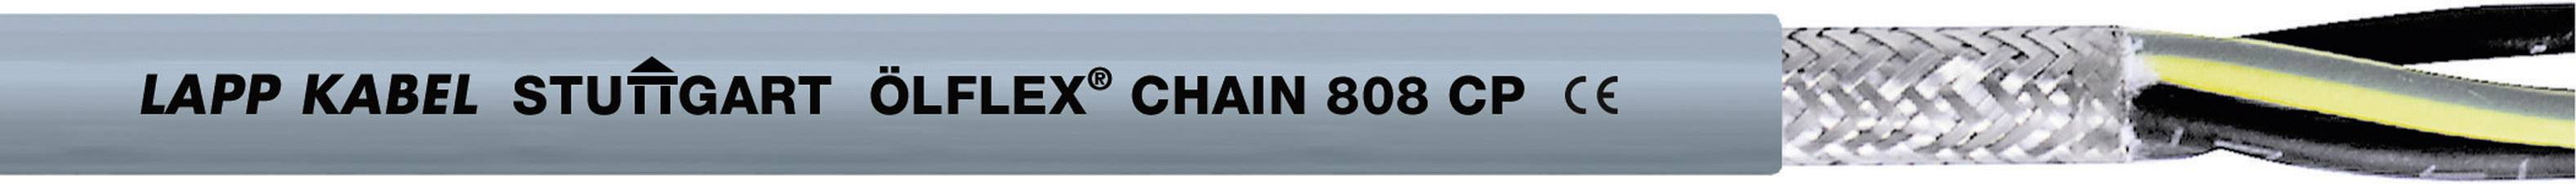 Žíla kabelu LappKabel ÖLFLEX CHAIN 808 CP 4G0,5 (1027753), 4x 0,5 mm², polyurethan, Ø 6,6 mm, stíněný, 100 m,